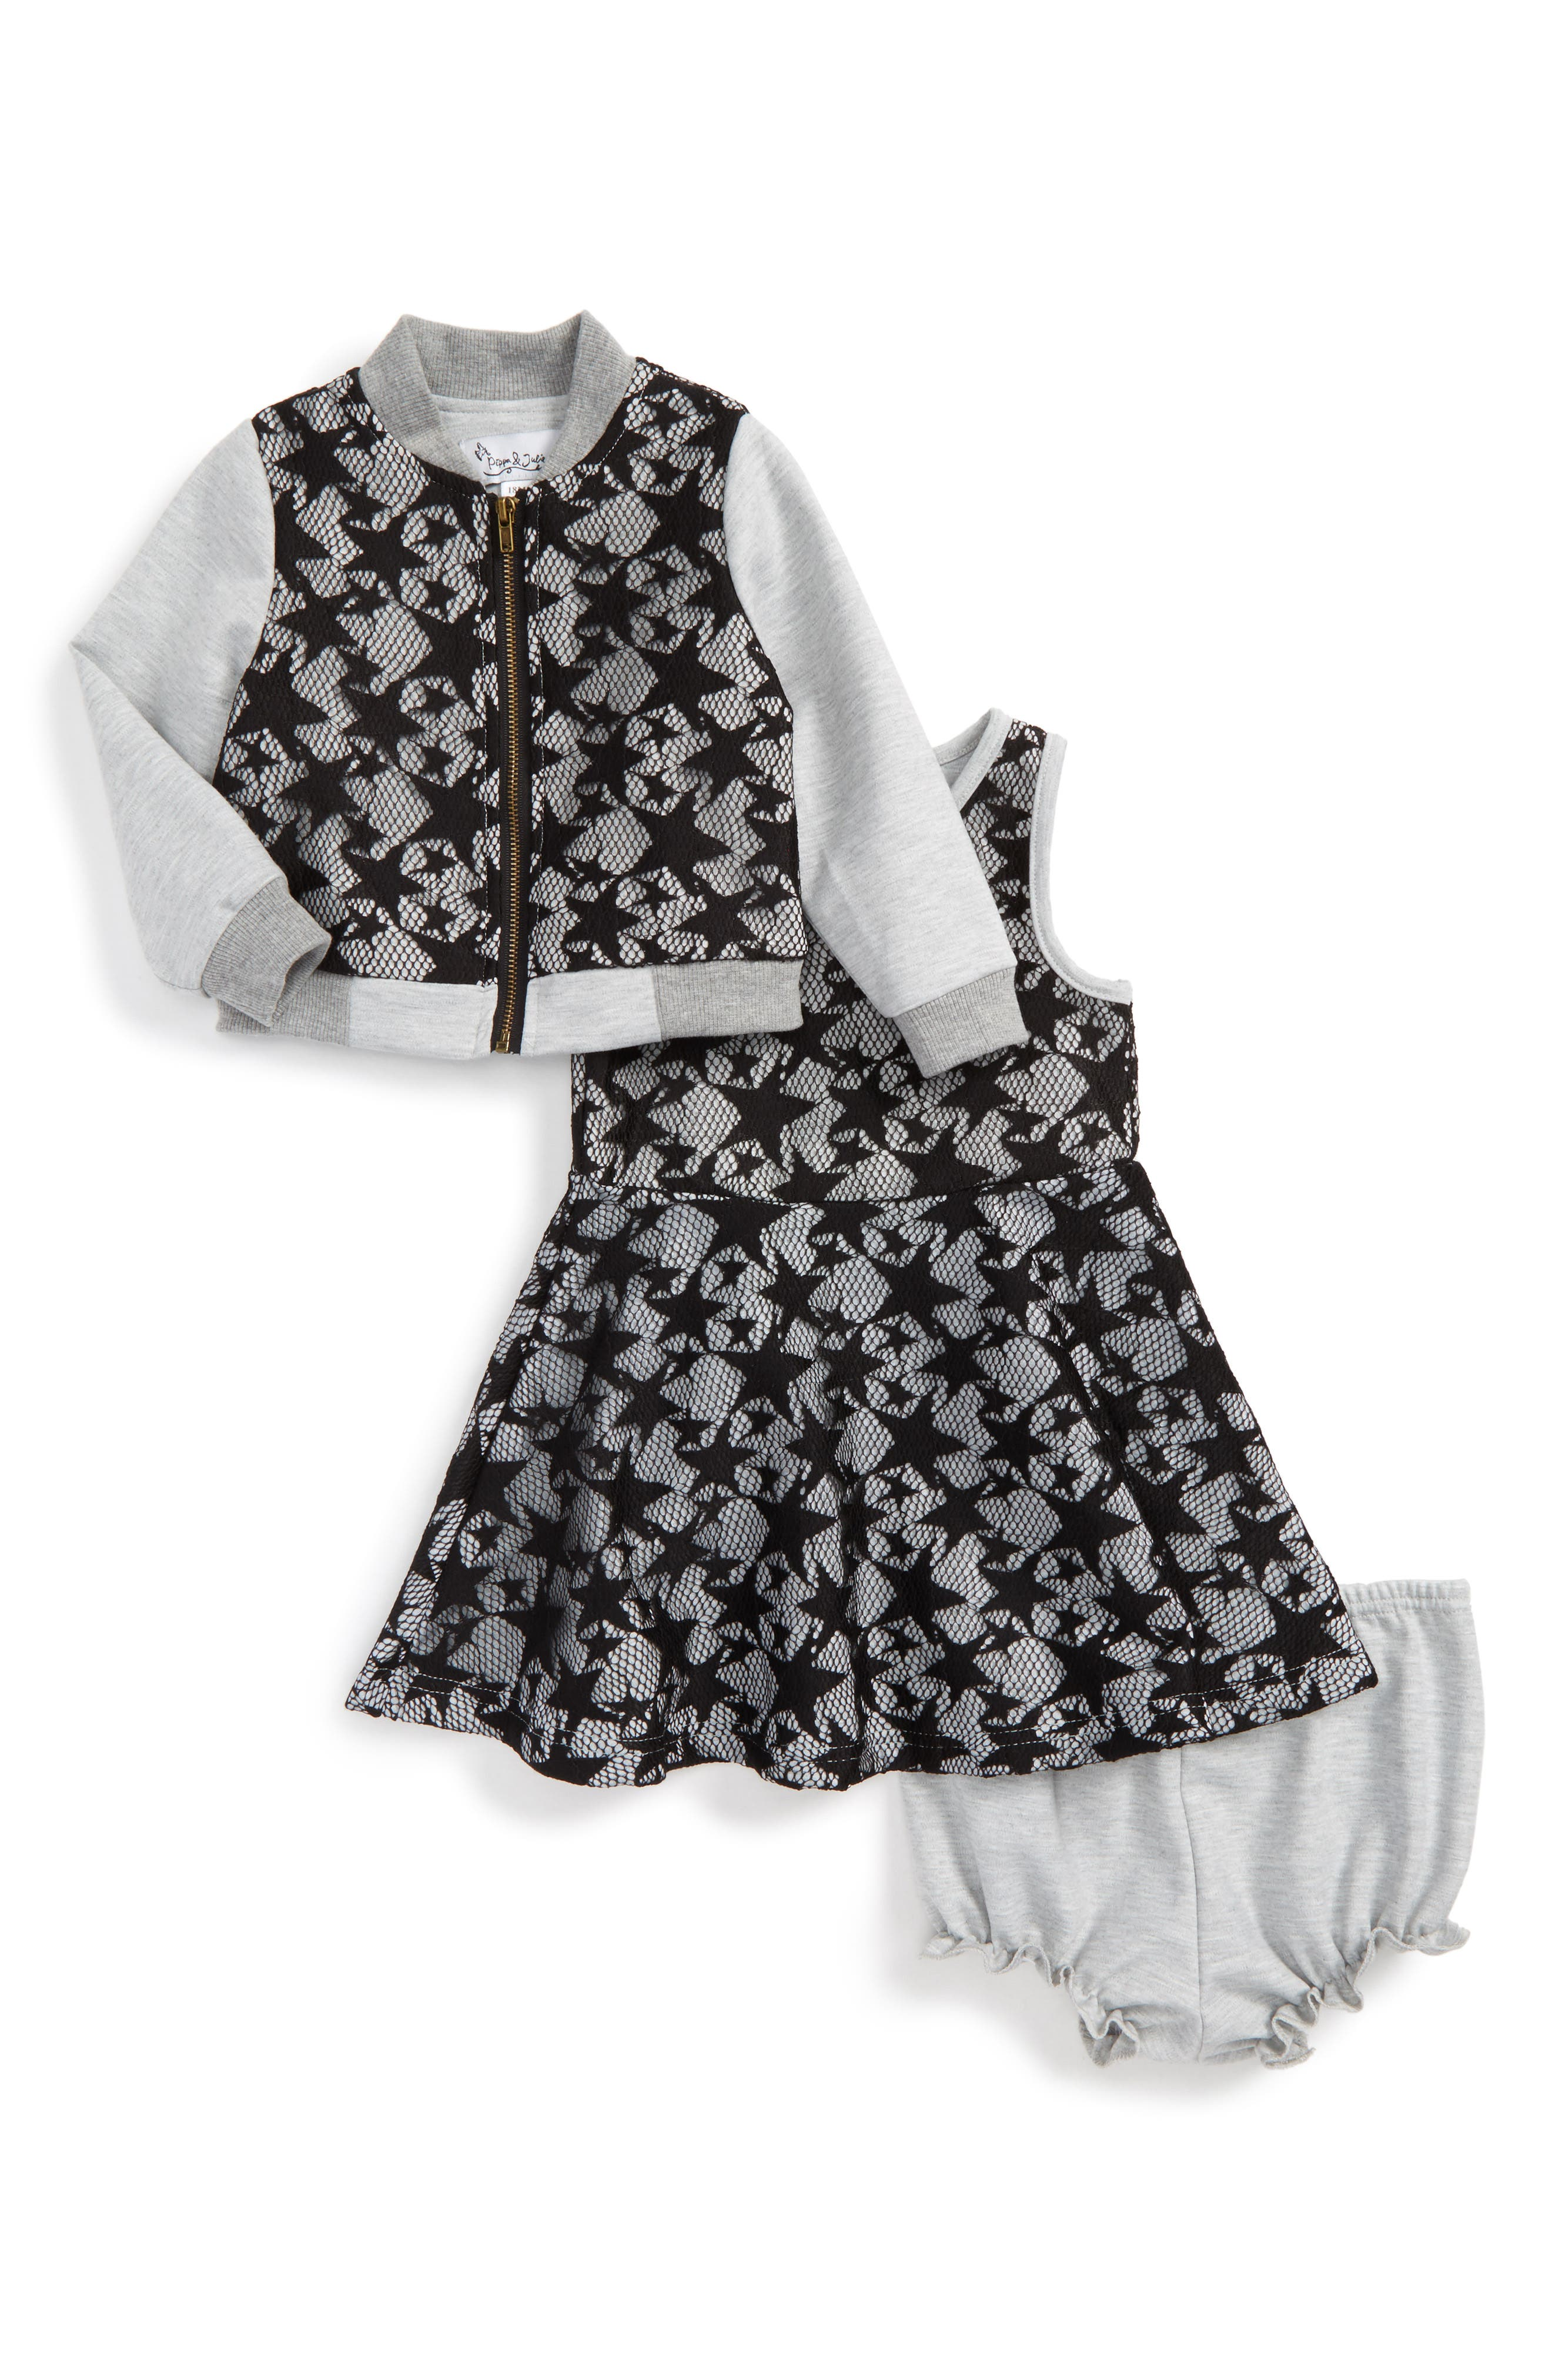 Star Lace Jacket & Dress Set,                             Main thumbnail 1, color,                             Black/ Grey